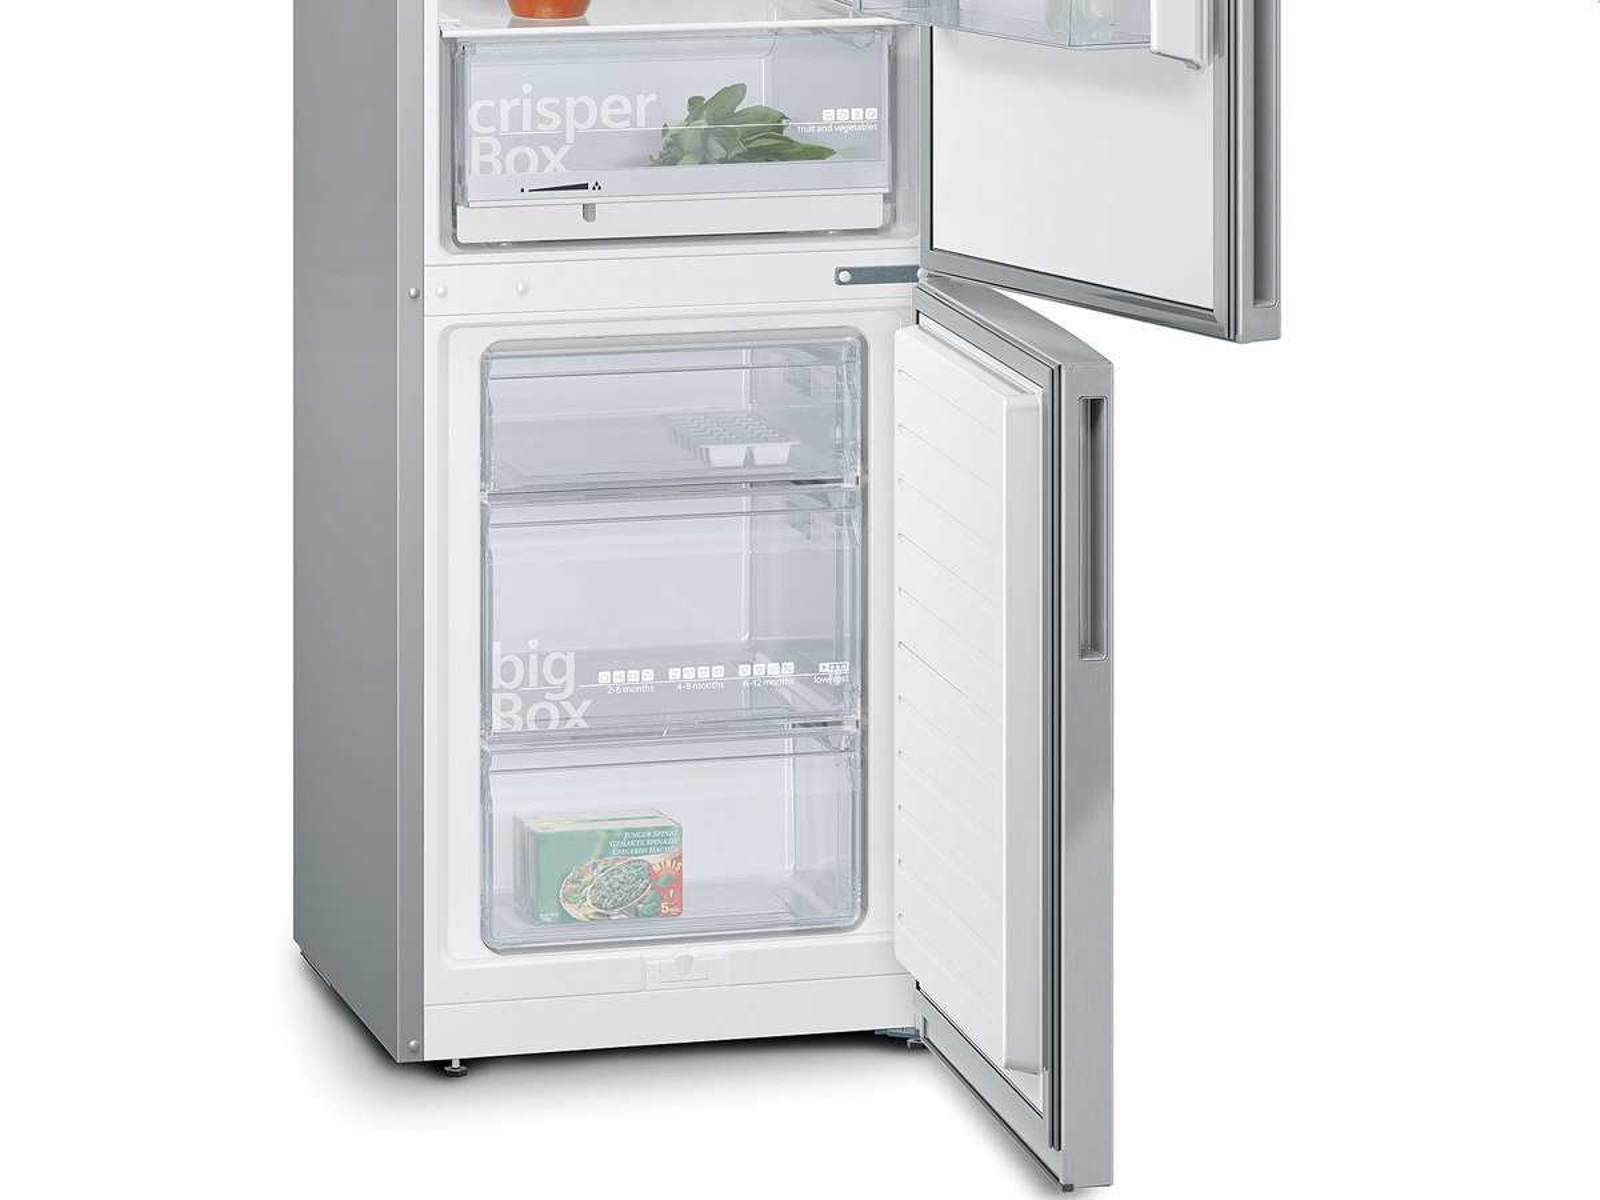 Siemens Kühlschrank Silber : Siemens kg vvl kühl gefrierkombination edelstahl look